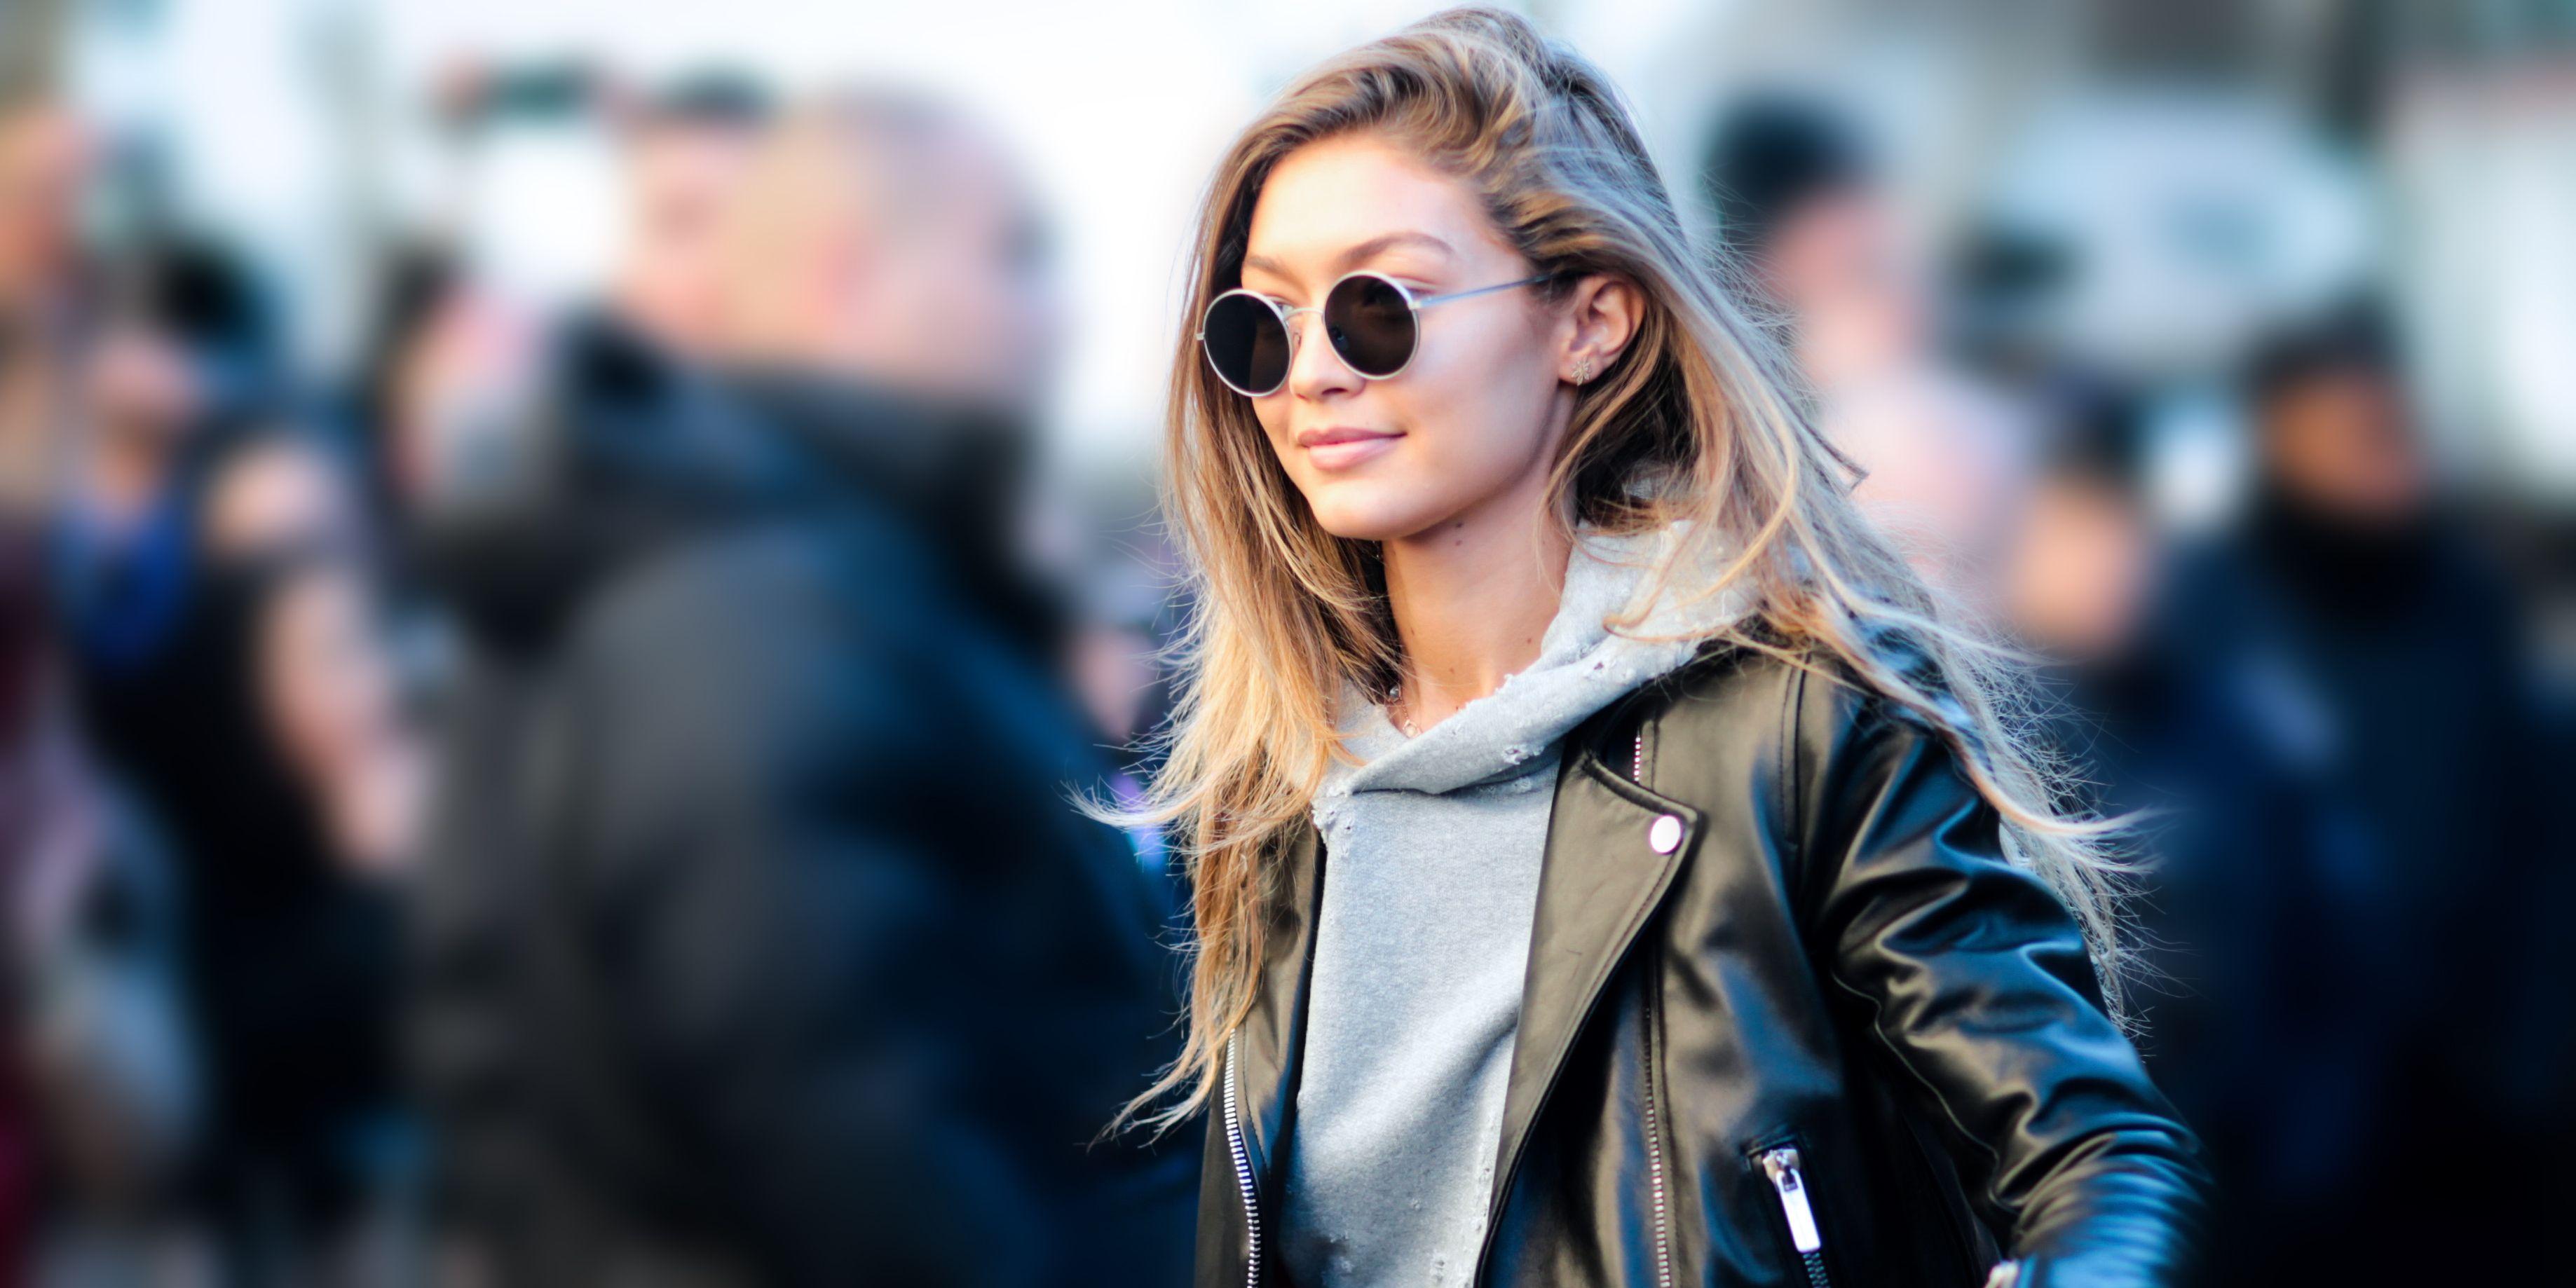 b5be54b82d 32 Best Sunglasses for Women in 2018 - Affordable Sunglasses for Women